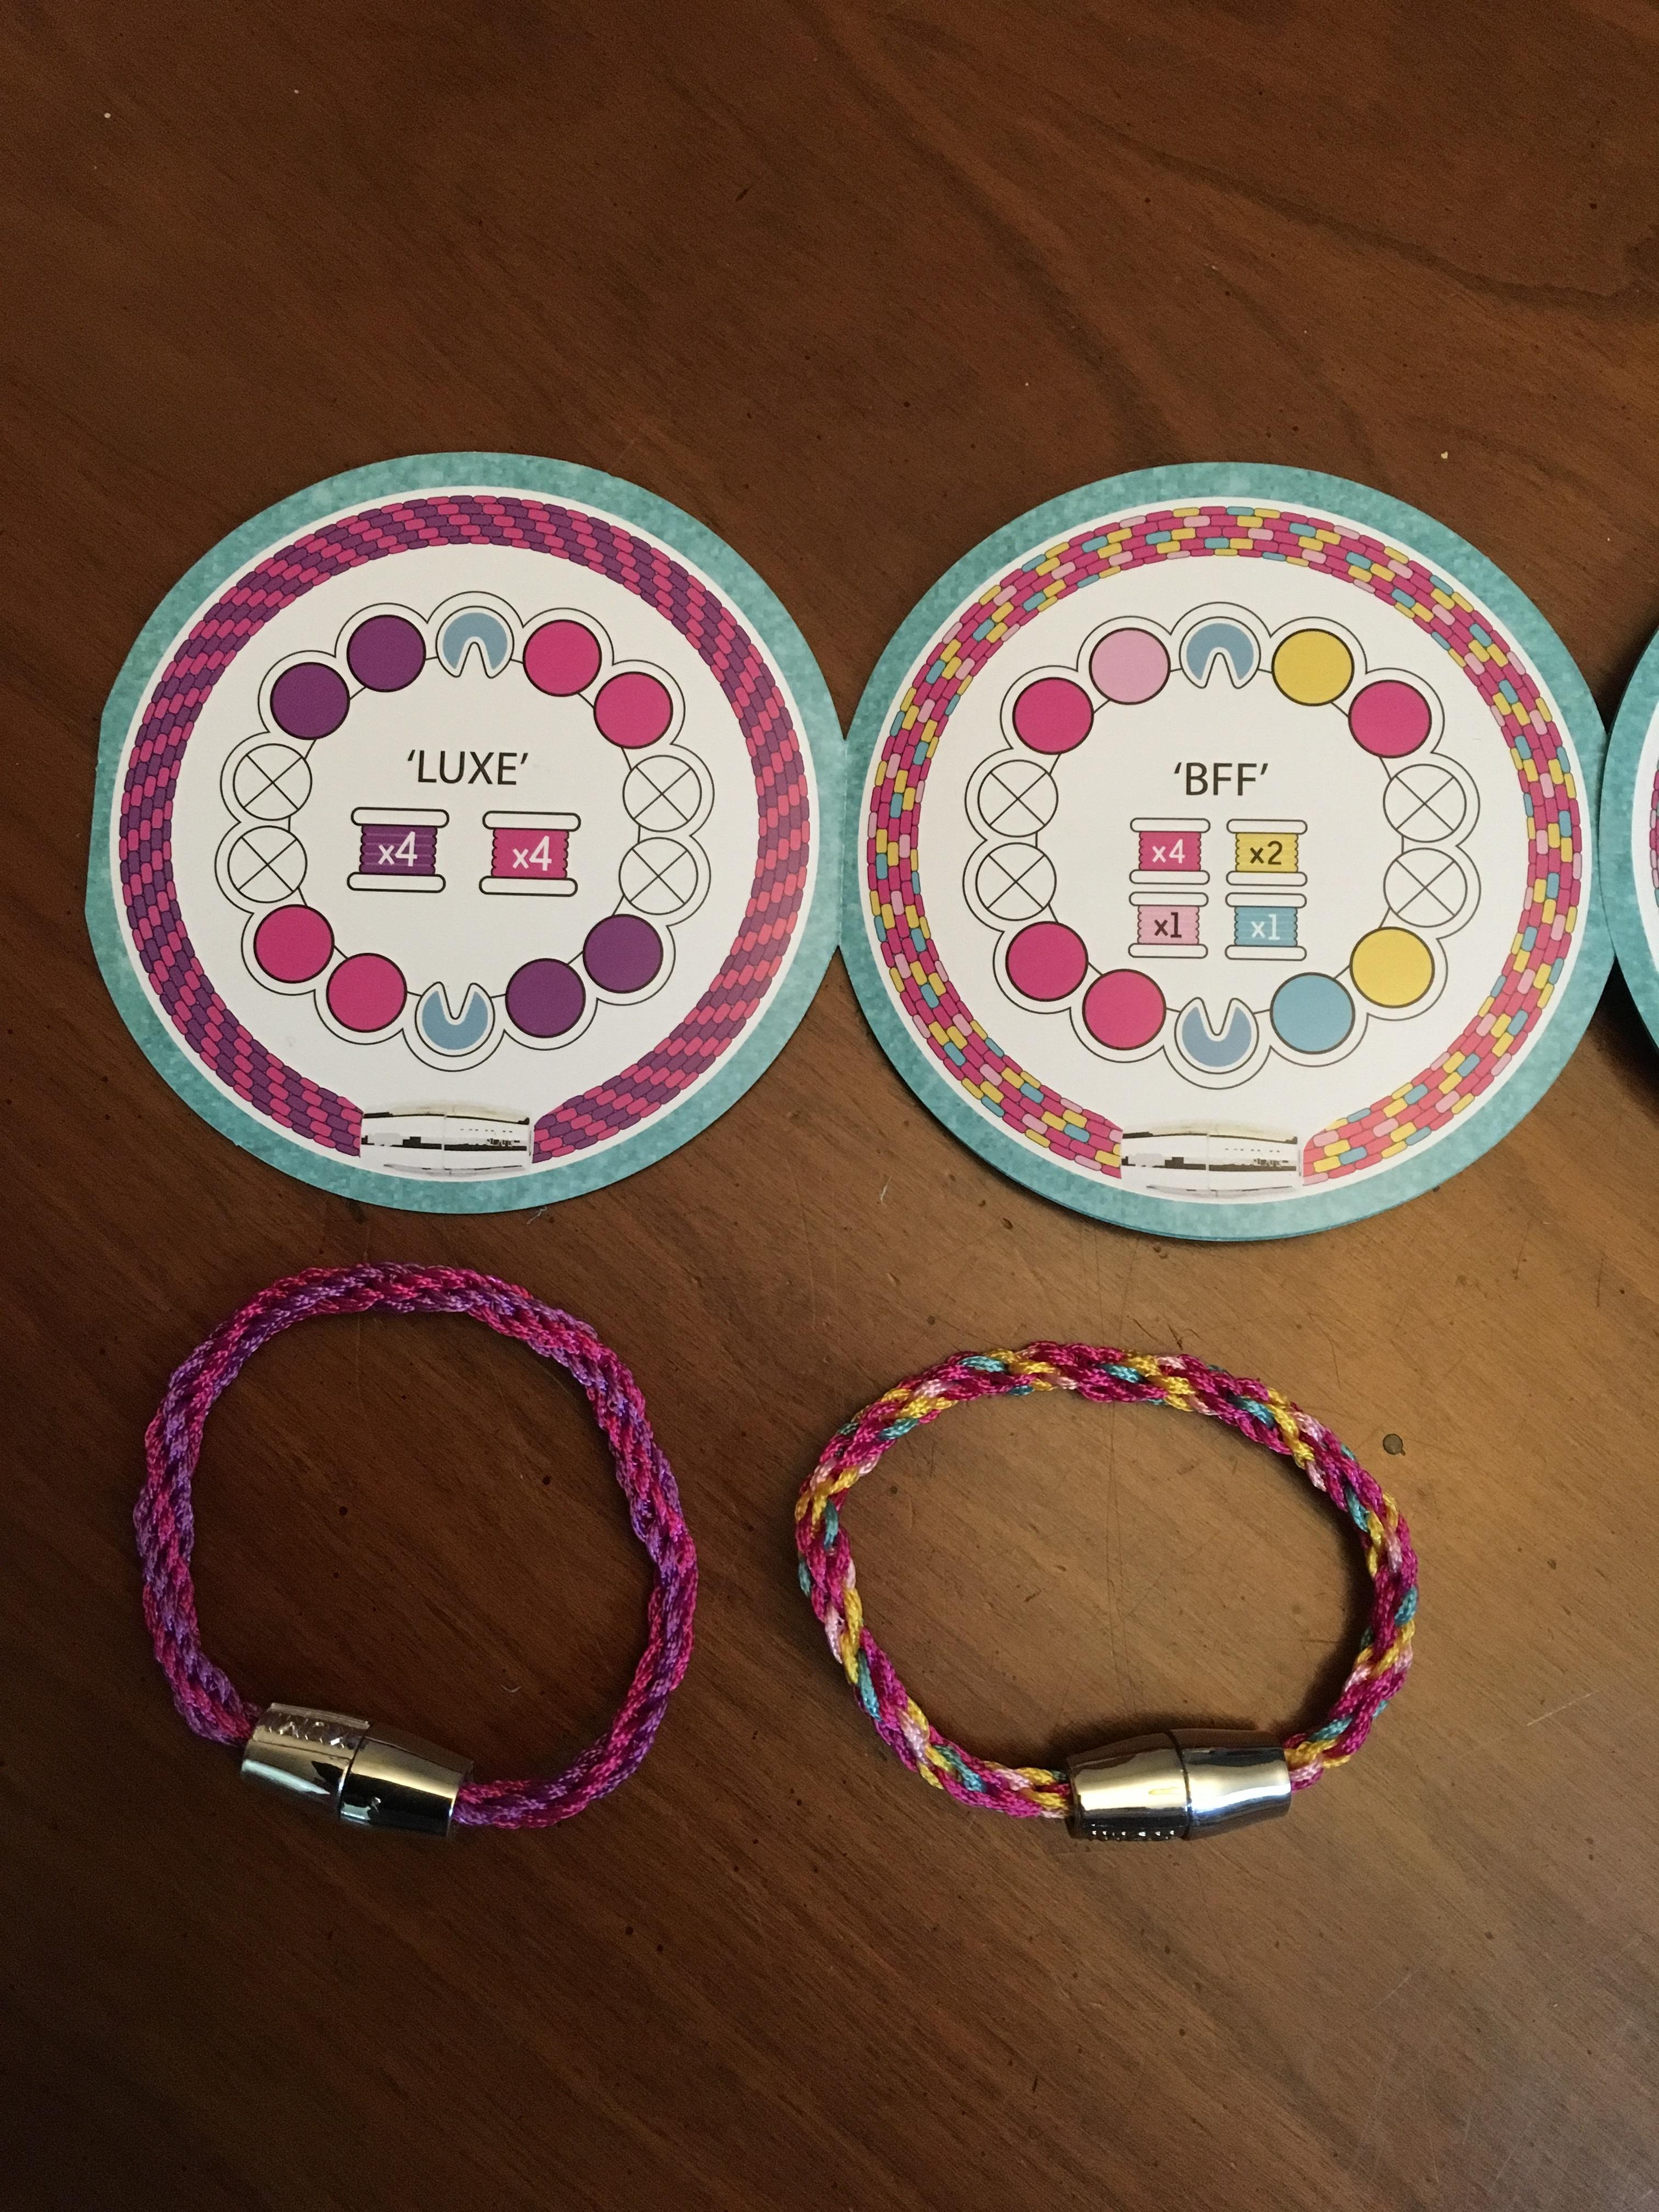 Cool Maker Kumikreator Friendship Bracelet Maker Reviews In Arts And